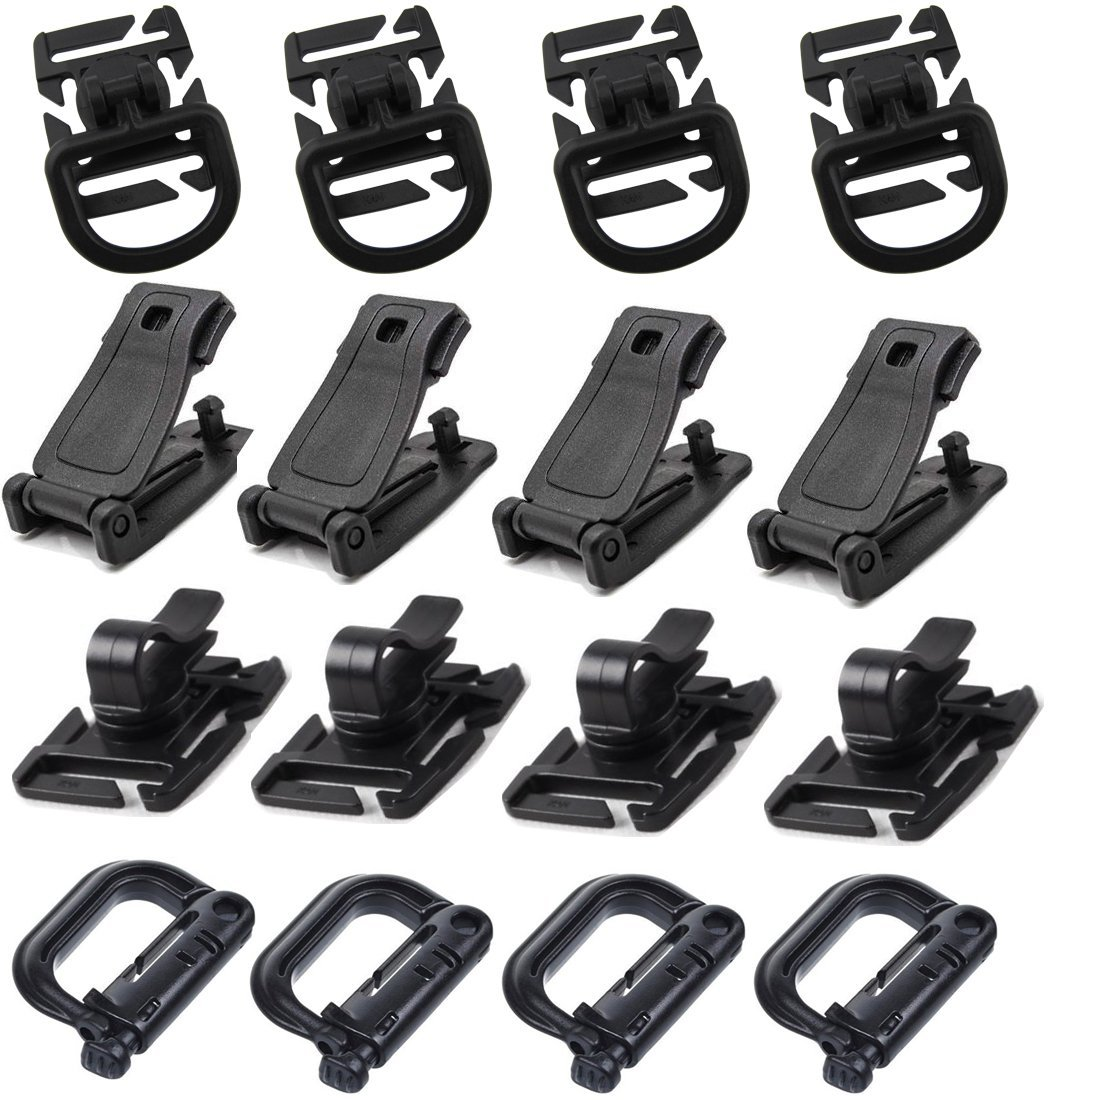 10Pcs Outdoor MOLLE Tactical Webbing Belt Strap Buckle Hanging Clips Carabiner